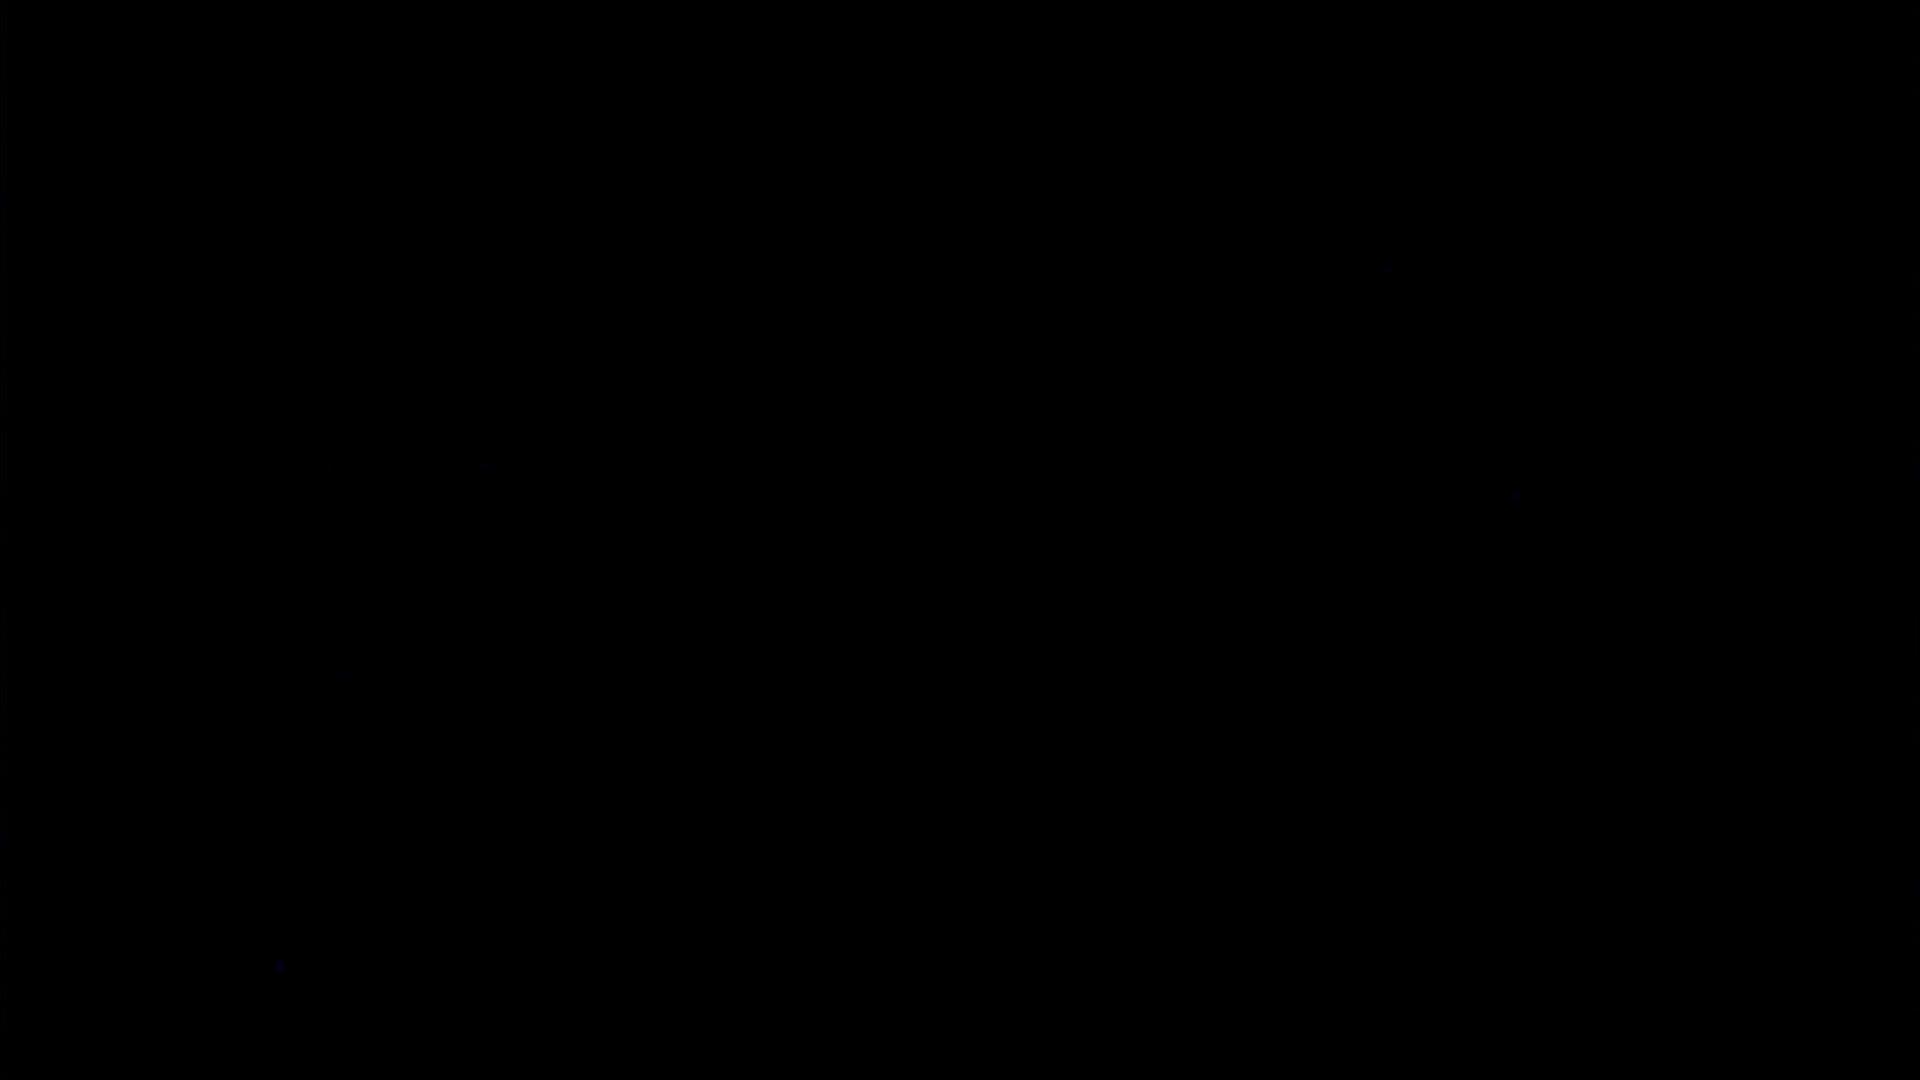 SPYさん初投稿!マンション覗き!5000K!ハイビジョン撮影VOL.04(現役ラグビー部大学生編) 投稿 ゲイアダルトビデオ画像 74枚 18